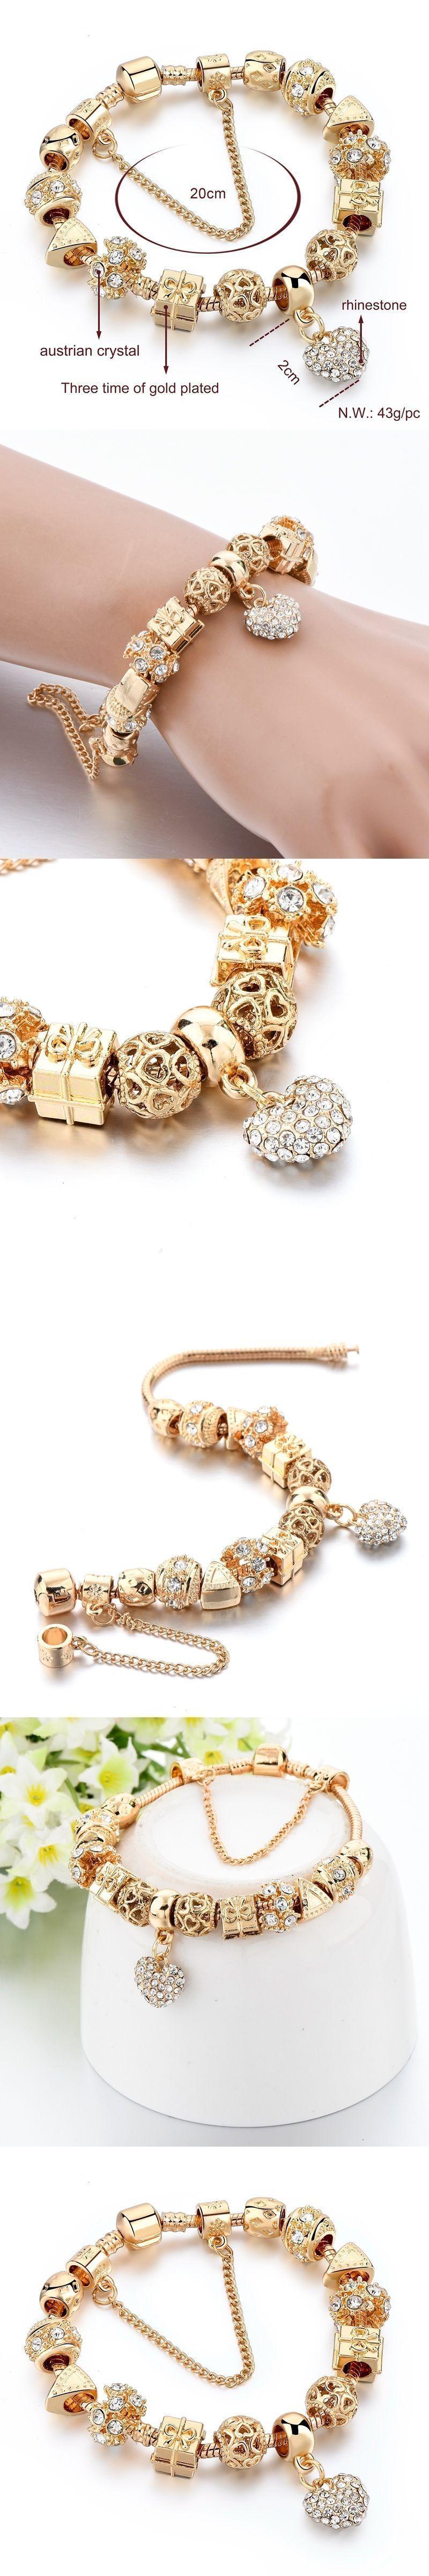 Longway new fashion jewelry heart charm bracelets for women crystal